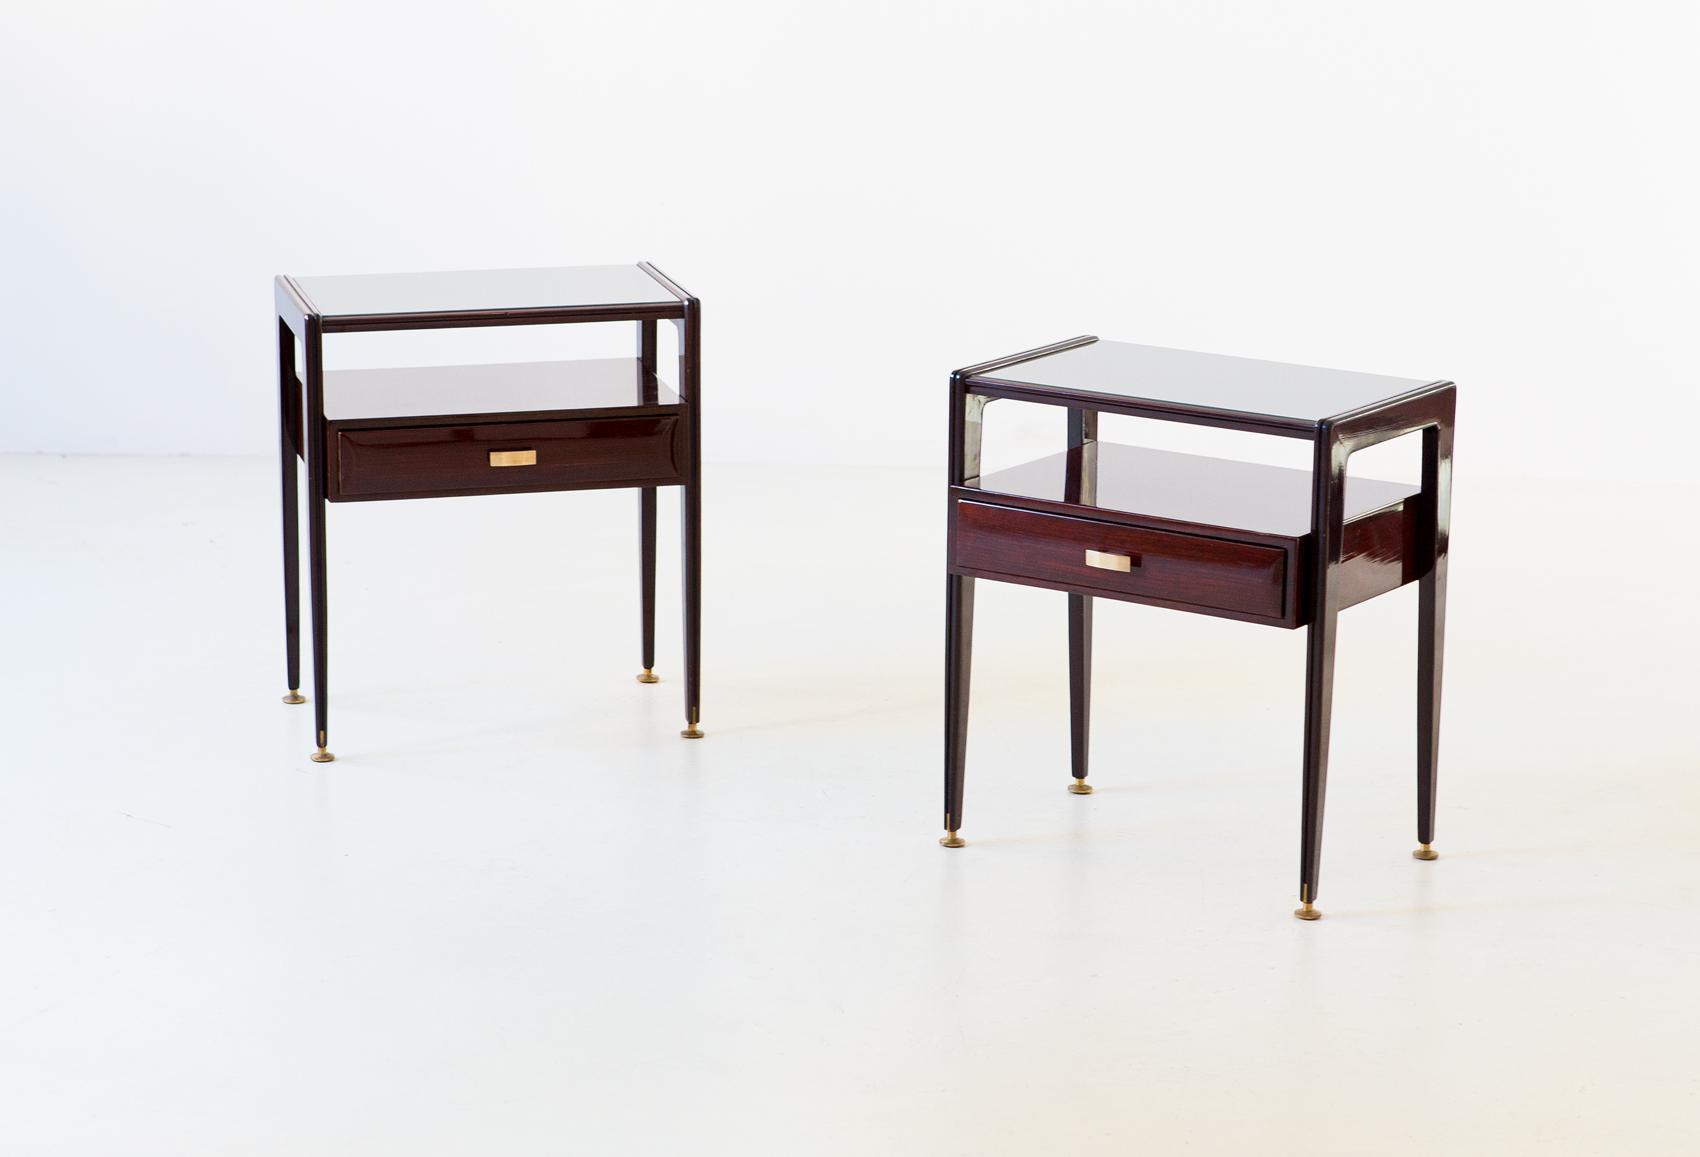 1950s-italian-nightstands-in-rosewood.with-glass-top-1-bt84